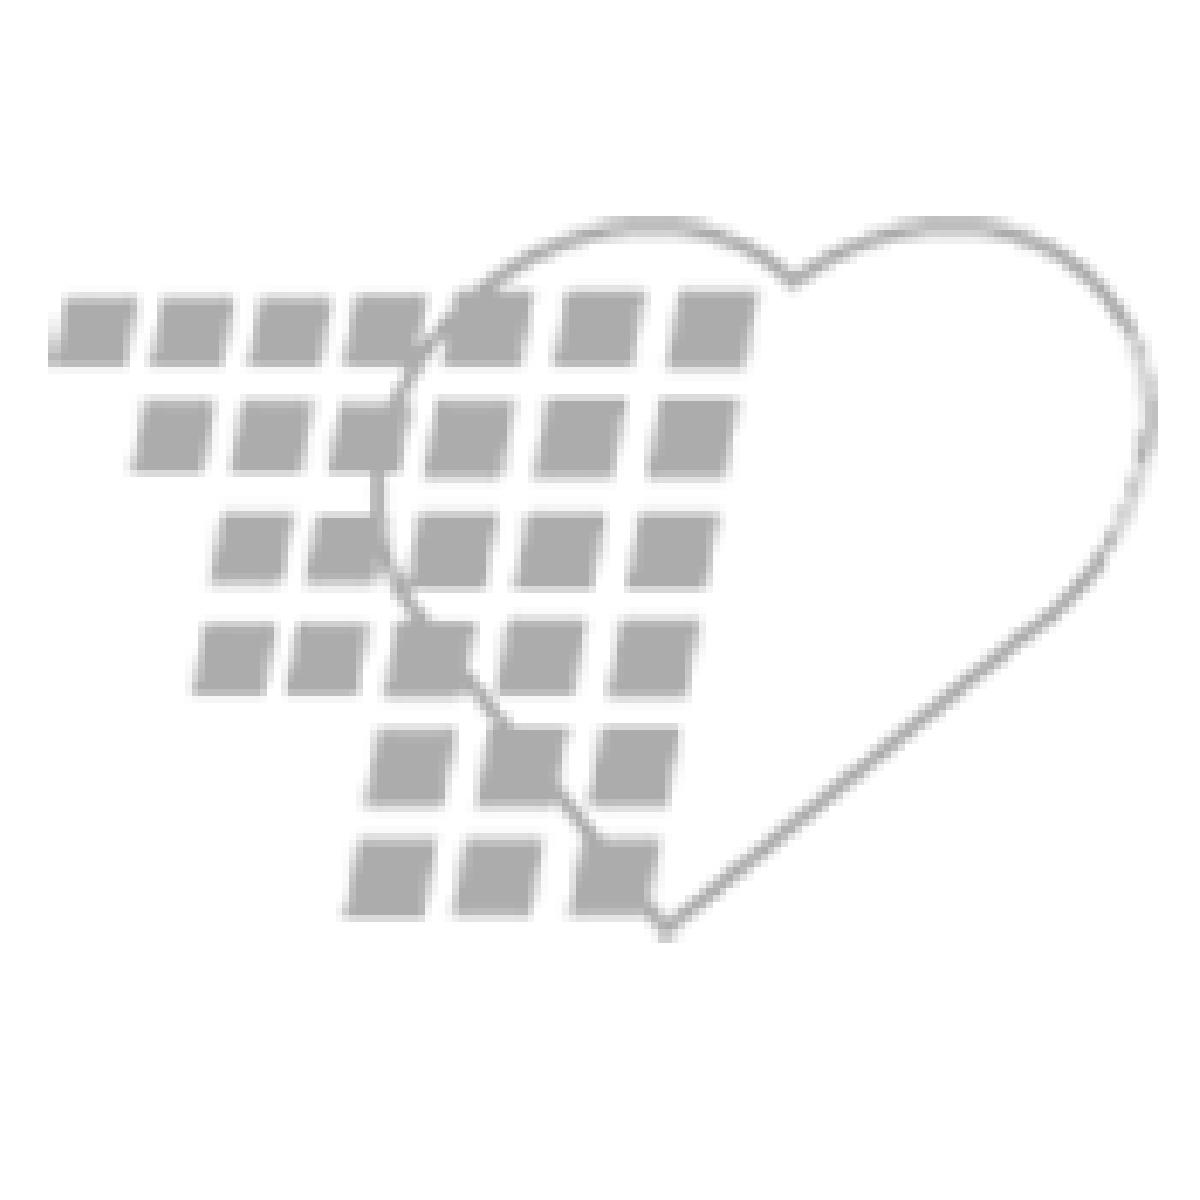 06-93-0089 - Demo Dose® Memantin (Namend) 10 mg - 100 Pills/Bottle